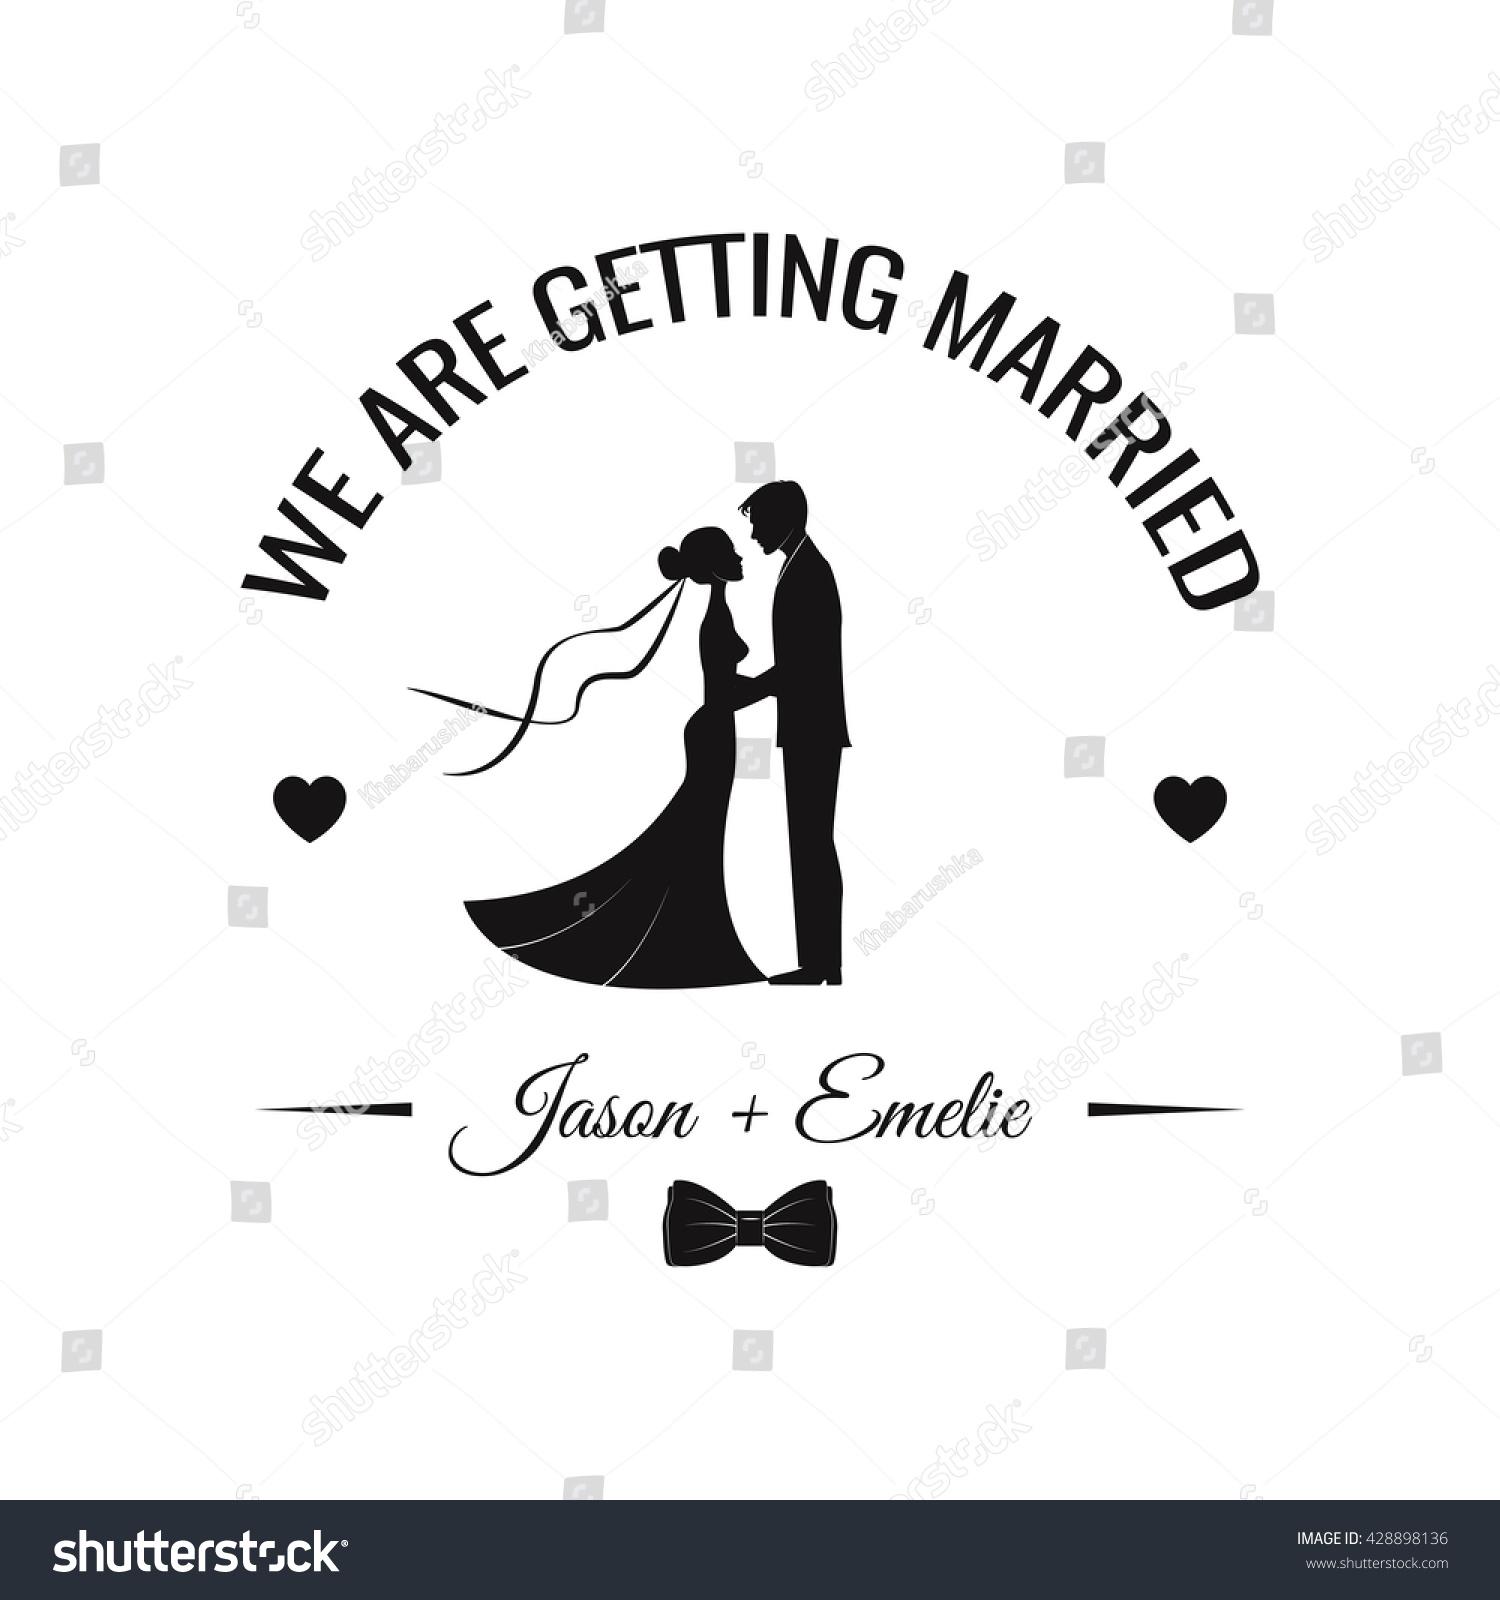 Wedding invitation vector silhouette bride groom stock vector wedding invitation vector silhouette bride and groom wedding couple save the date stopboris Images